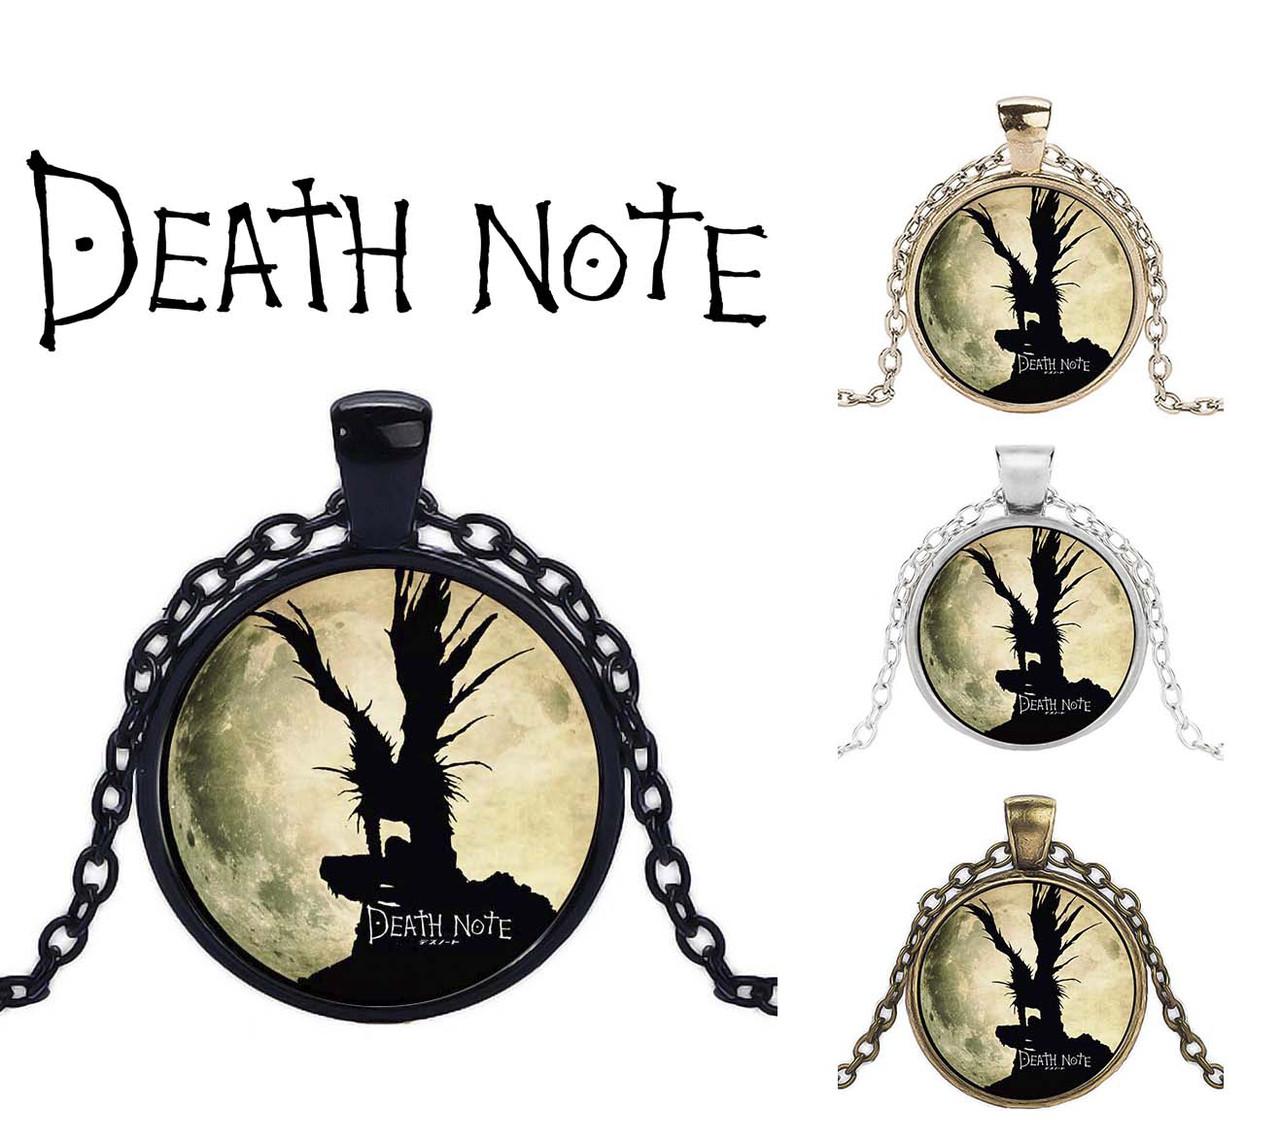 Кулон с изображением Рюка из Тетради смерти Death note